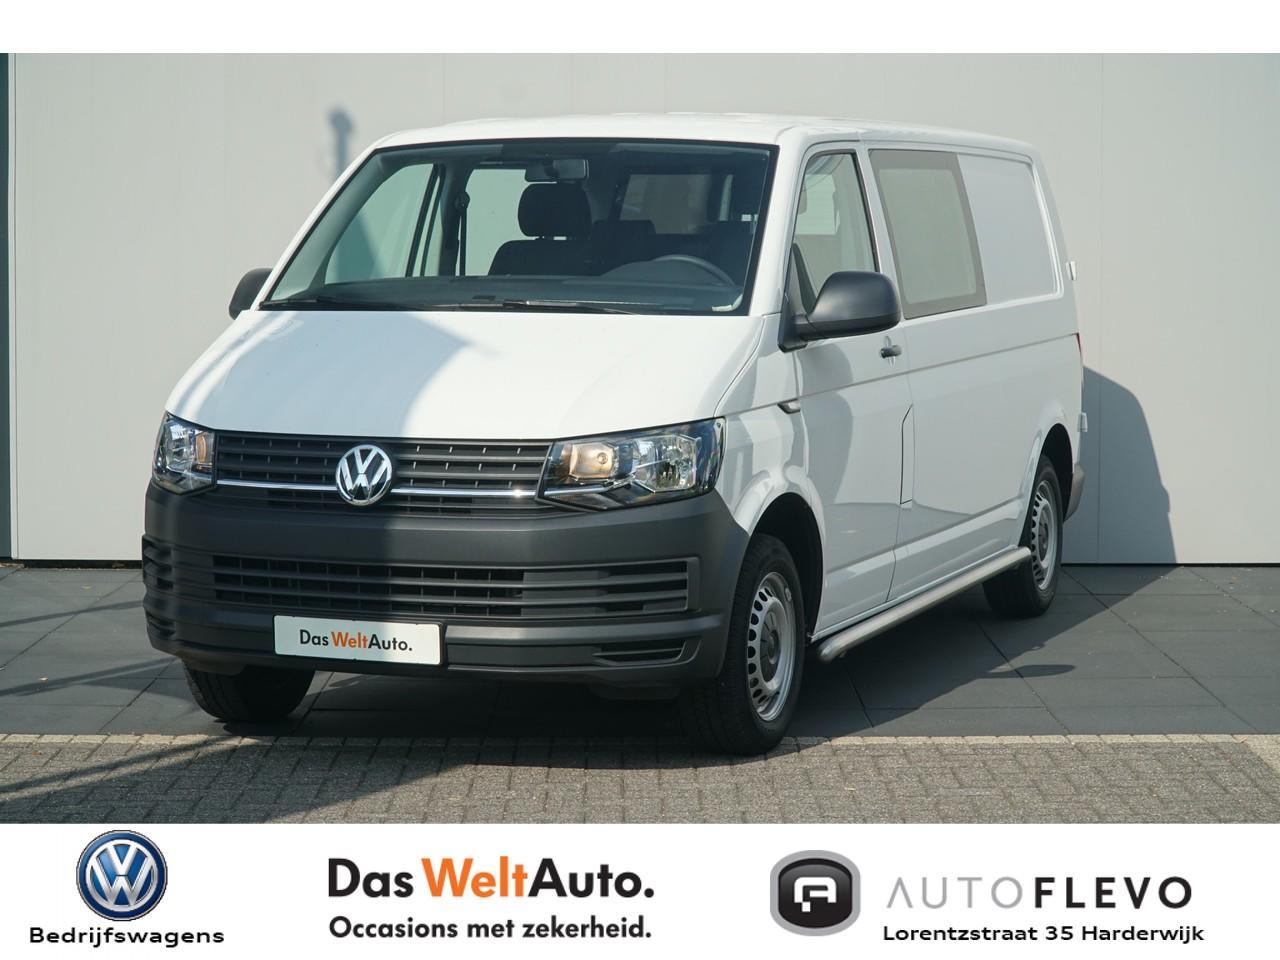 Volkswagen Transporter 2.0tdi dubbele cabine l2h1